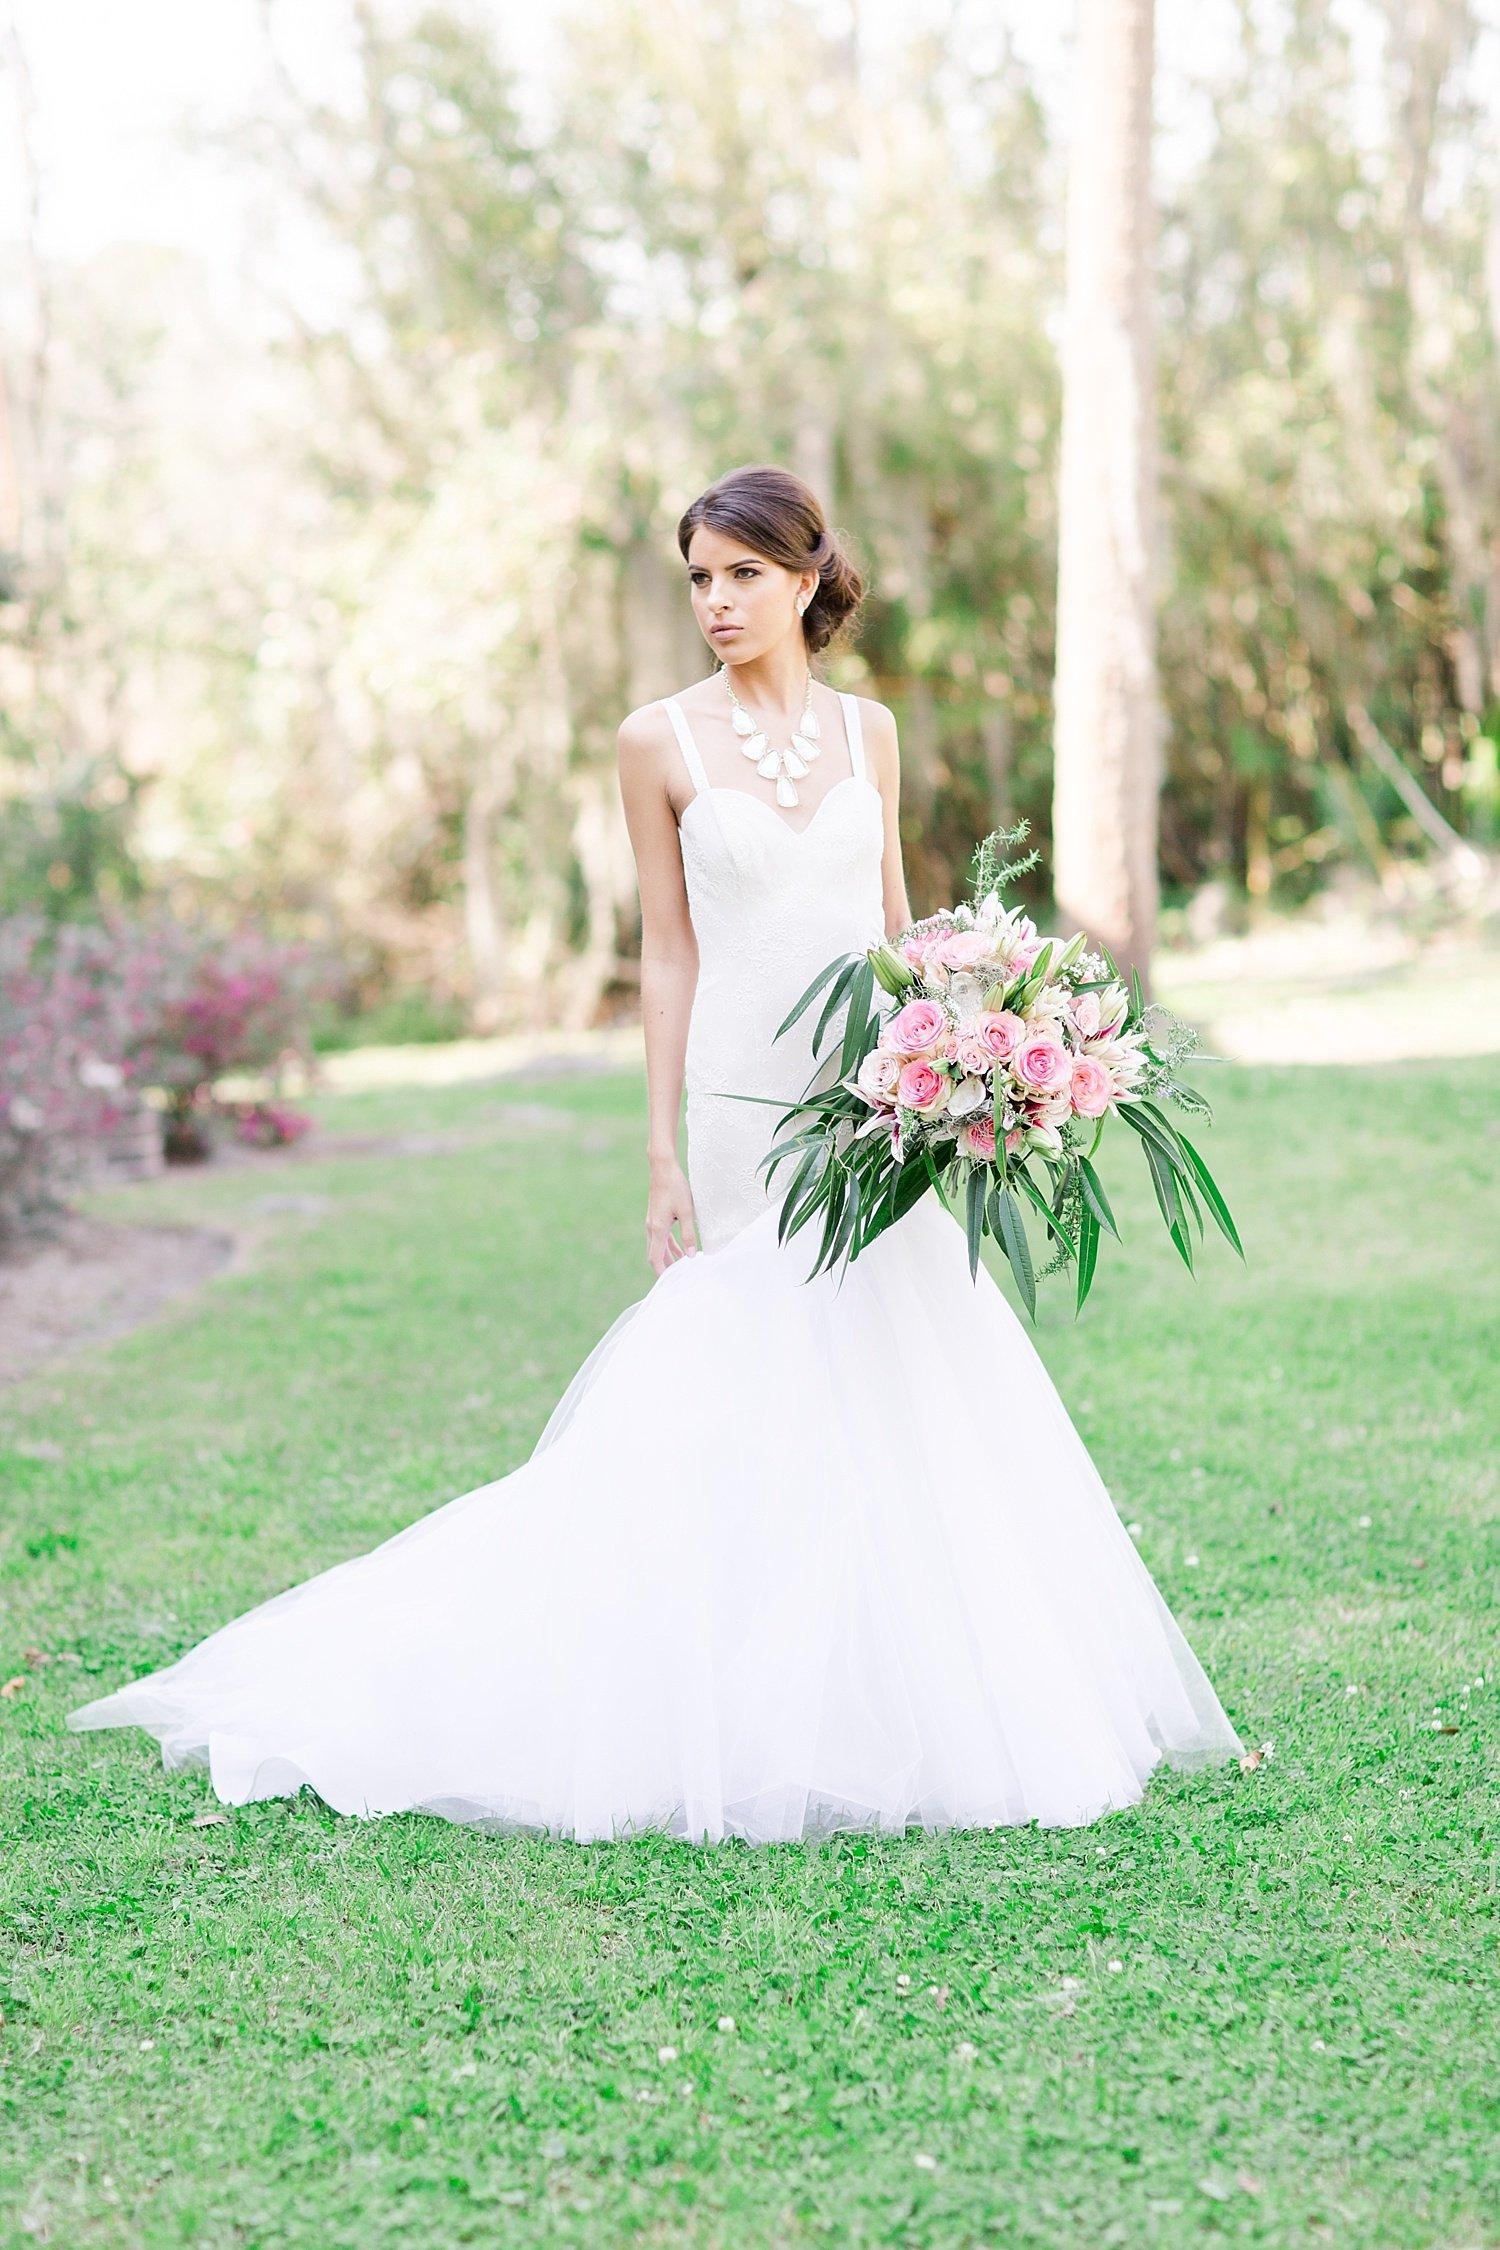 rachel-strickland-photography-katie-may-ivory-and-beau-bridal-boutique-bethesda-academy-wedding-whitfield-chapel-wedding-savannah-bridal-boutique-savannah-weddings-savannah-wedding-savannah-wedding-planner-savannah-bridal-gowns-savannah-bride-2.jpg